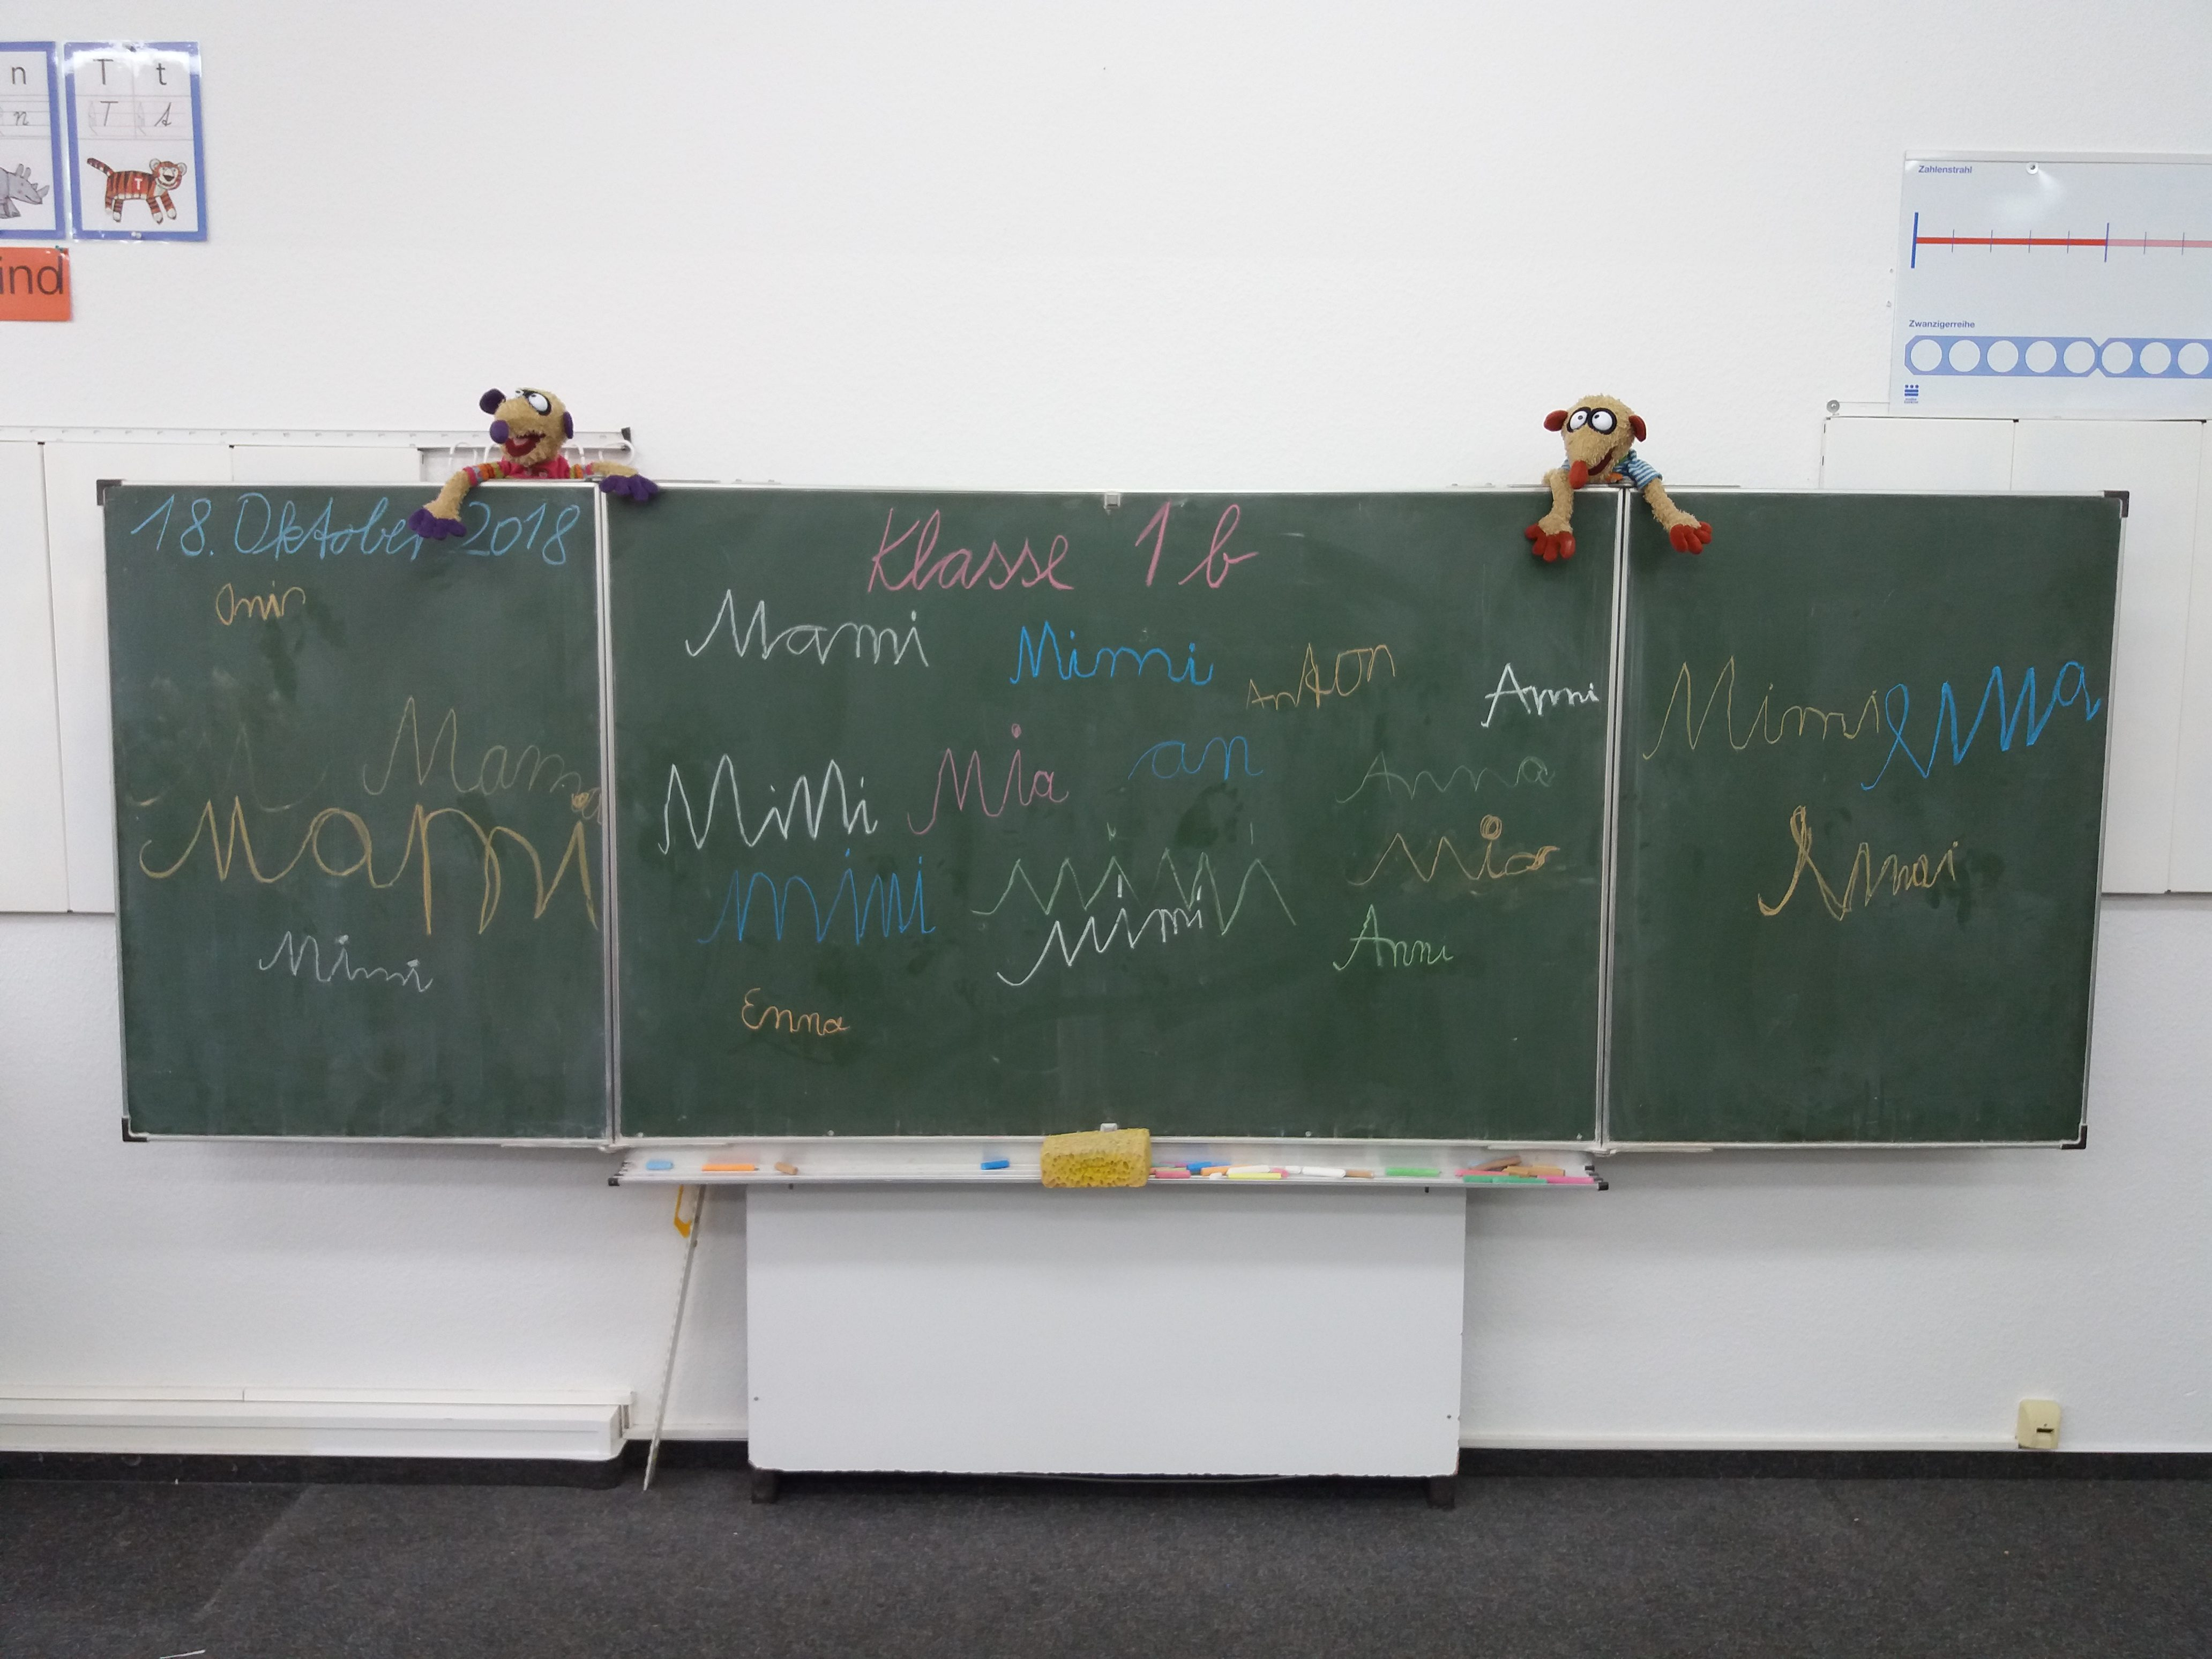 http://schule.neuseddin.de/wp-content/uploads/2016/10/Alte-Tafel_komplett-4128x3096.jpg